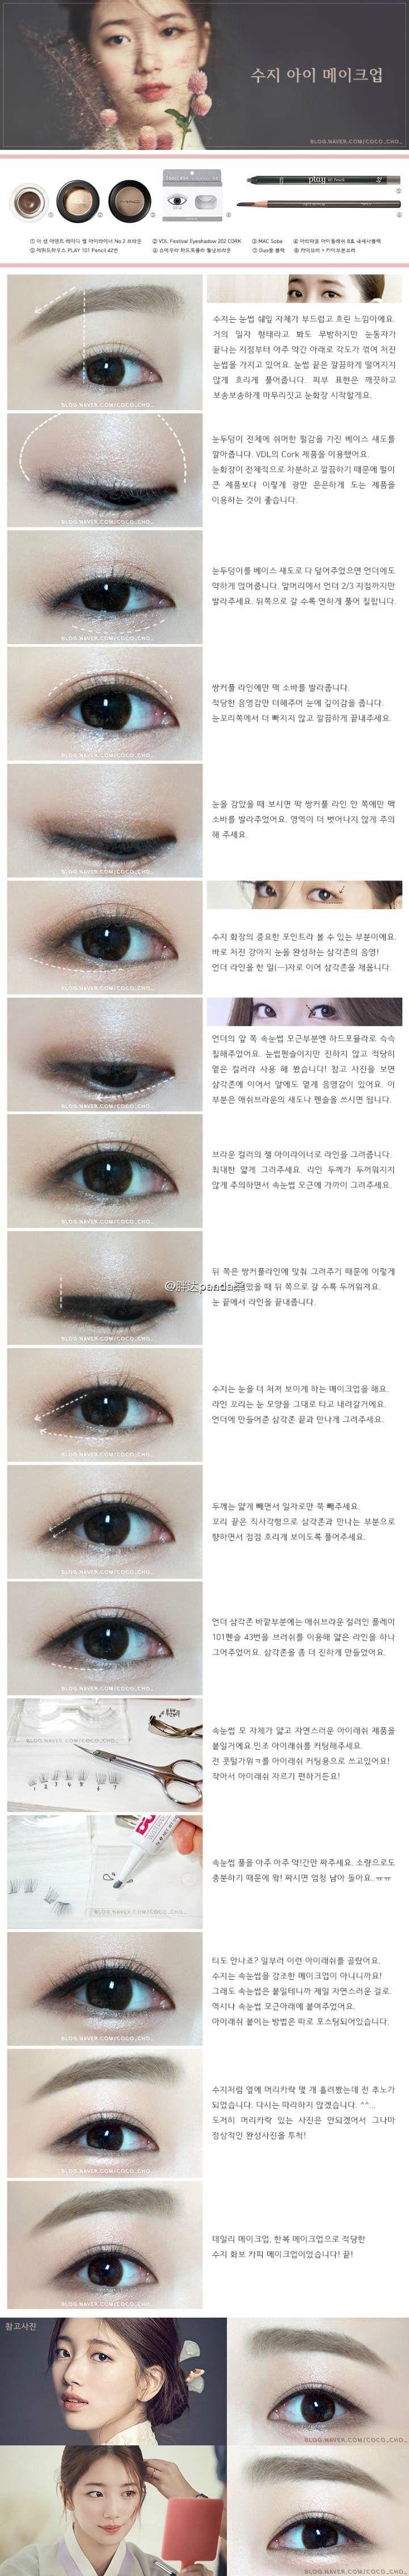 Peachy 17 Best Ideas About Korean Eyebrows On Pinterest Ulzzang Makeup Short Hairstyles Gunalazisus